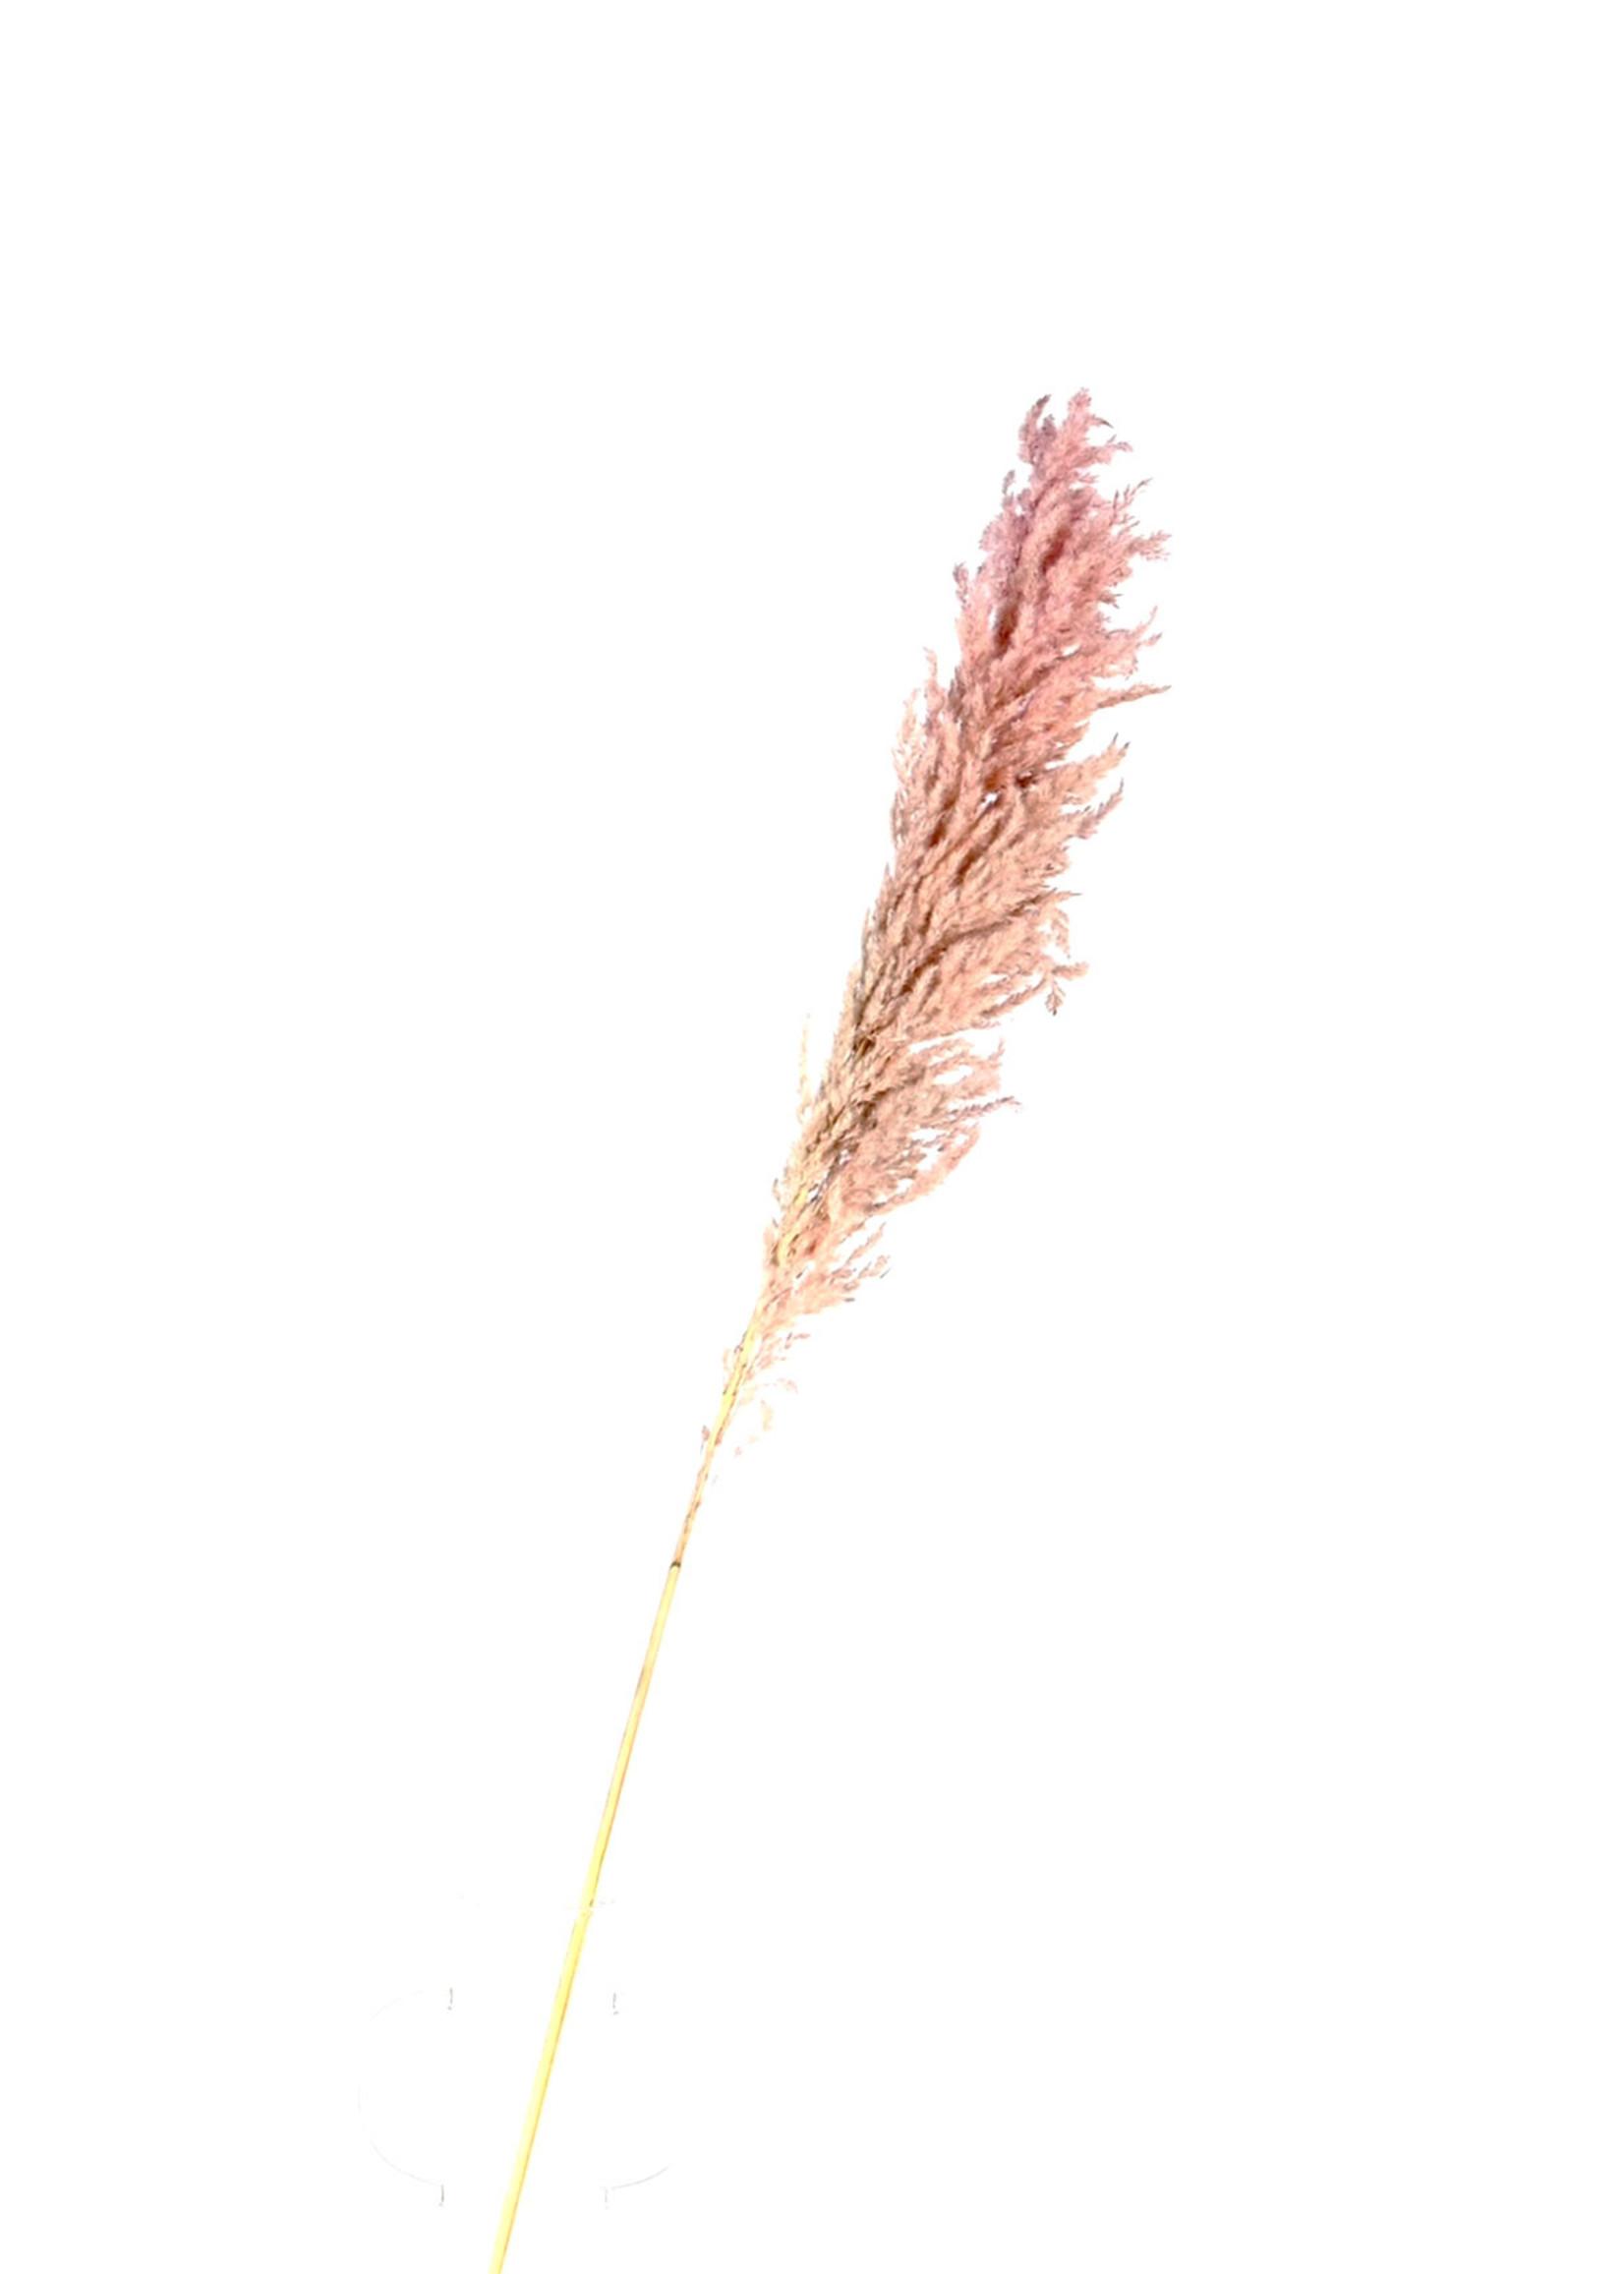 Dry flower pampas licht roze p/s